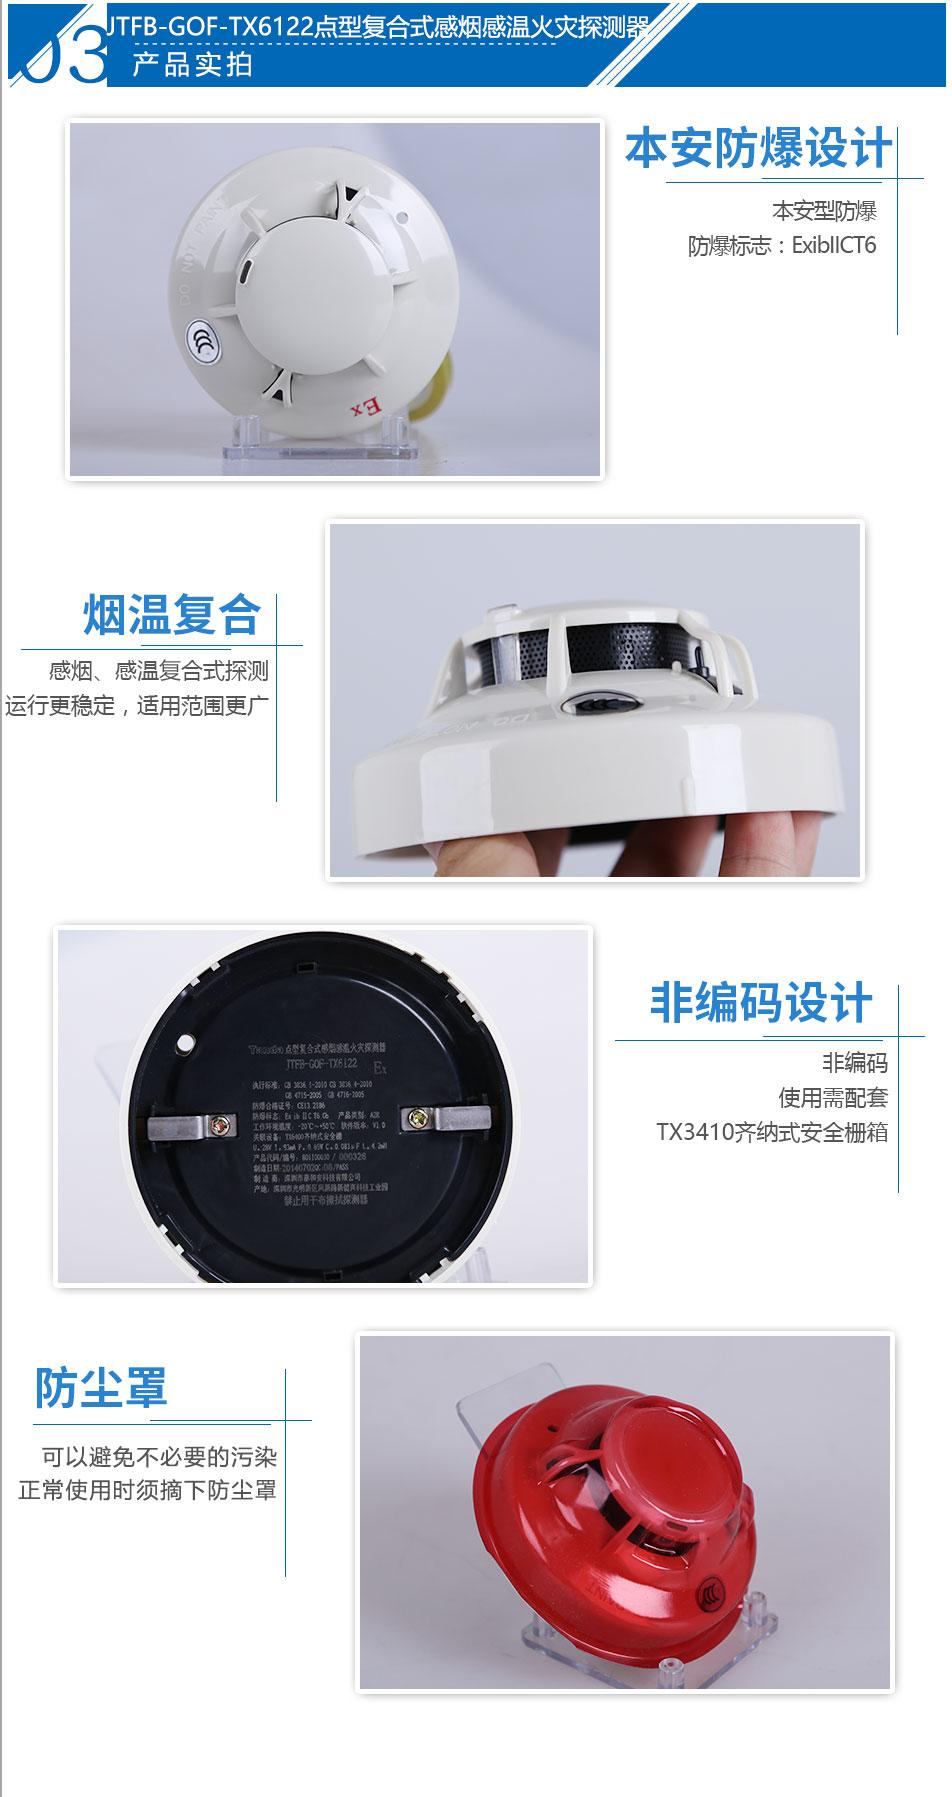 JTFB-GOF-TX6122点型复合式感烟感温火灾探测器产品实拍